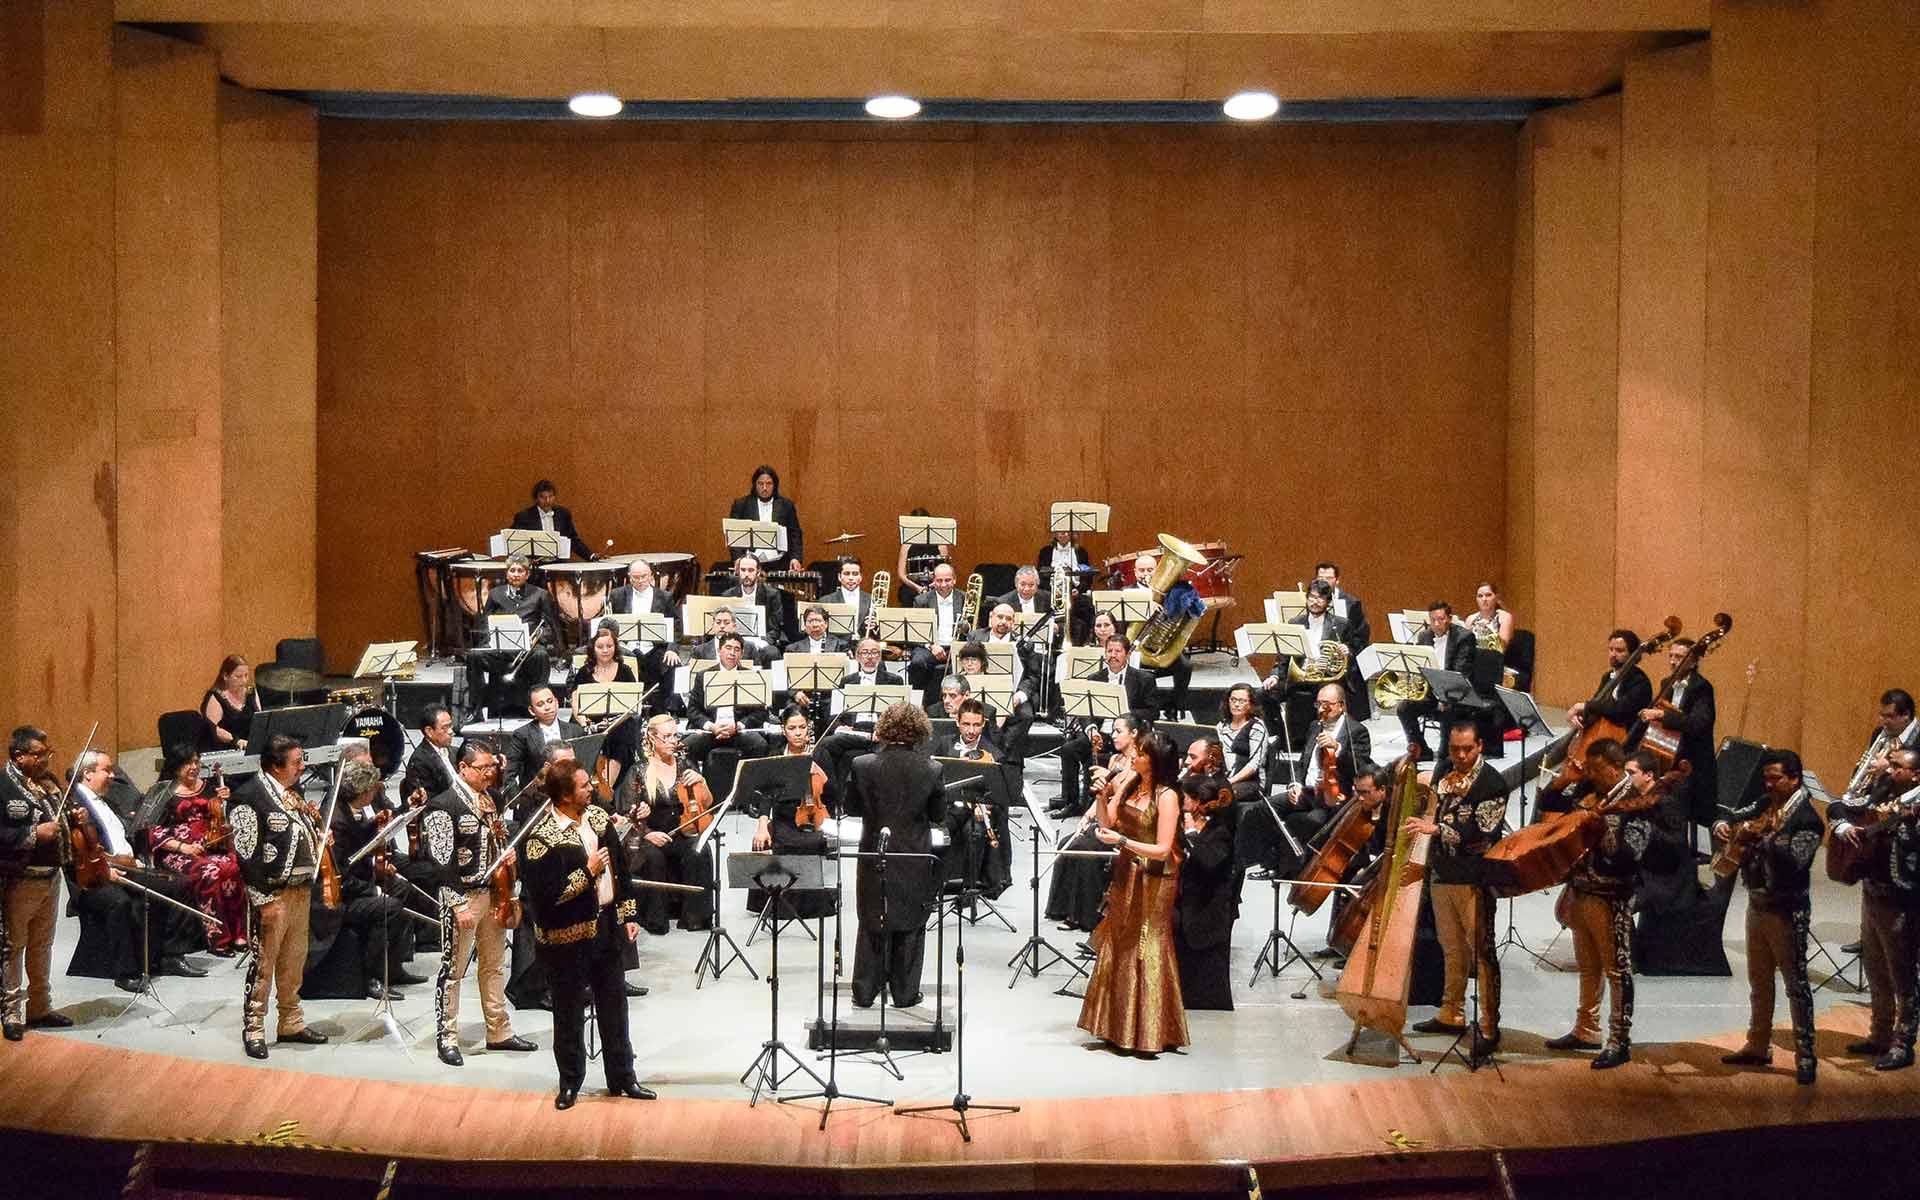 Ofrece OSIDEM concierto con mariachi